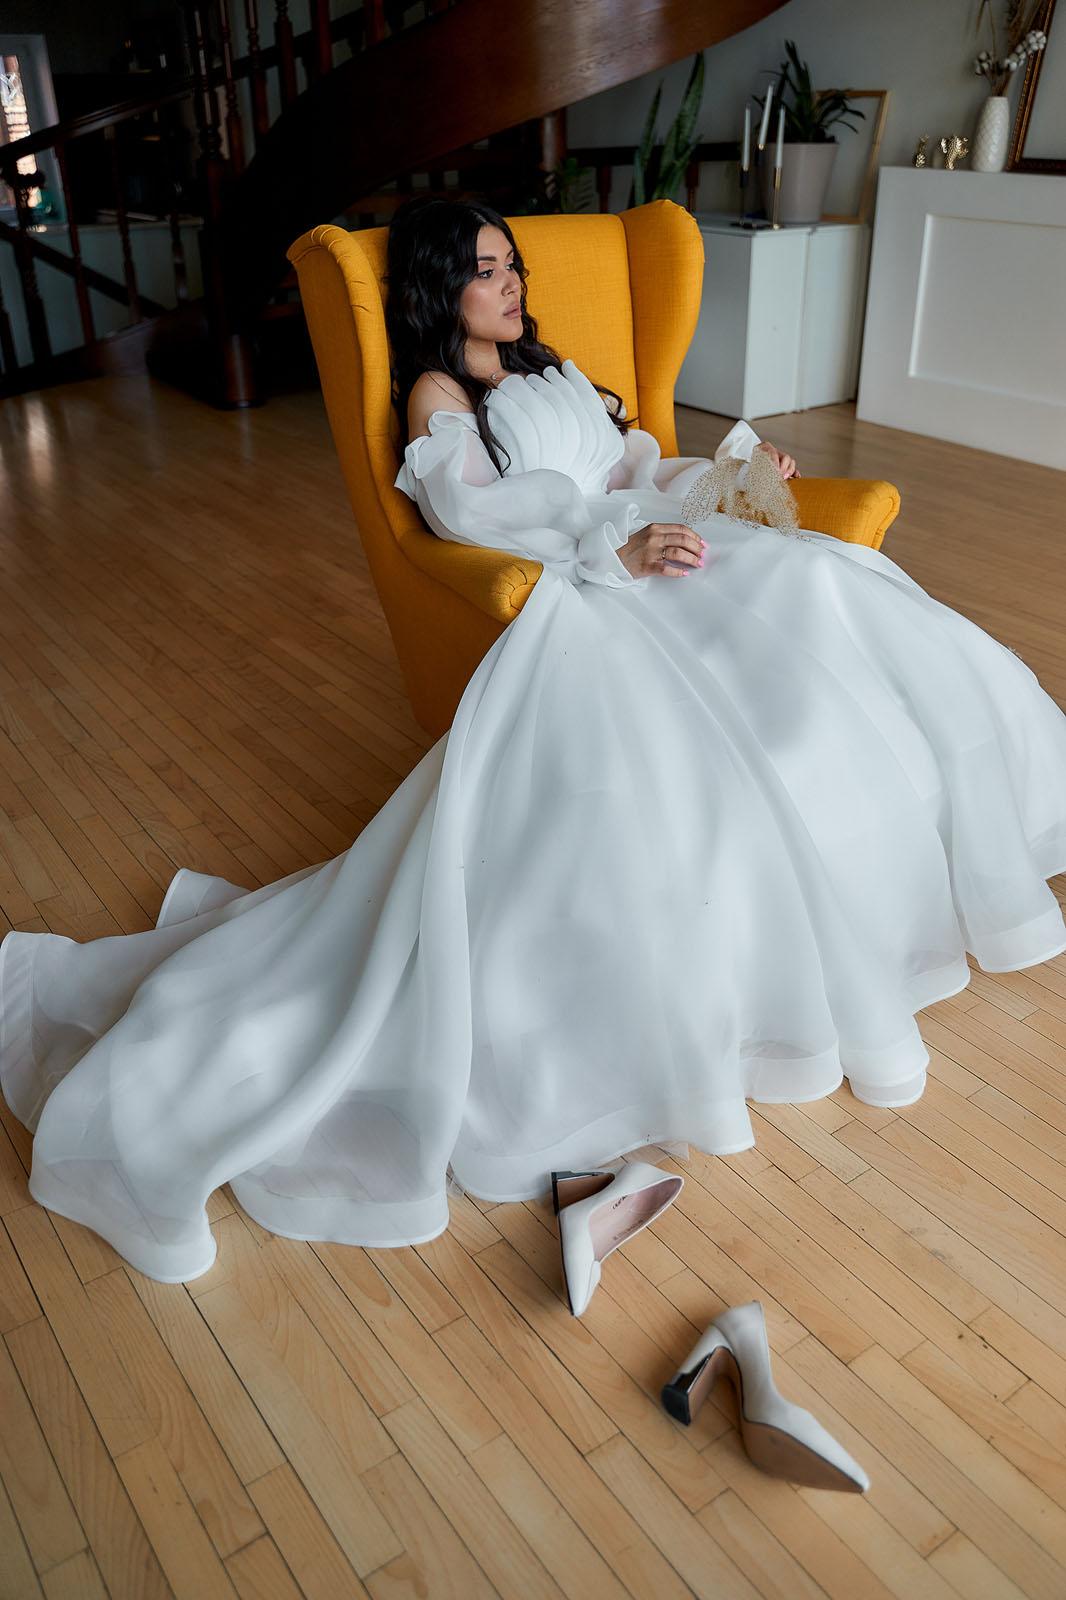 wedding@bekarev2021-04-10-11-47-52.jpg